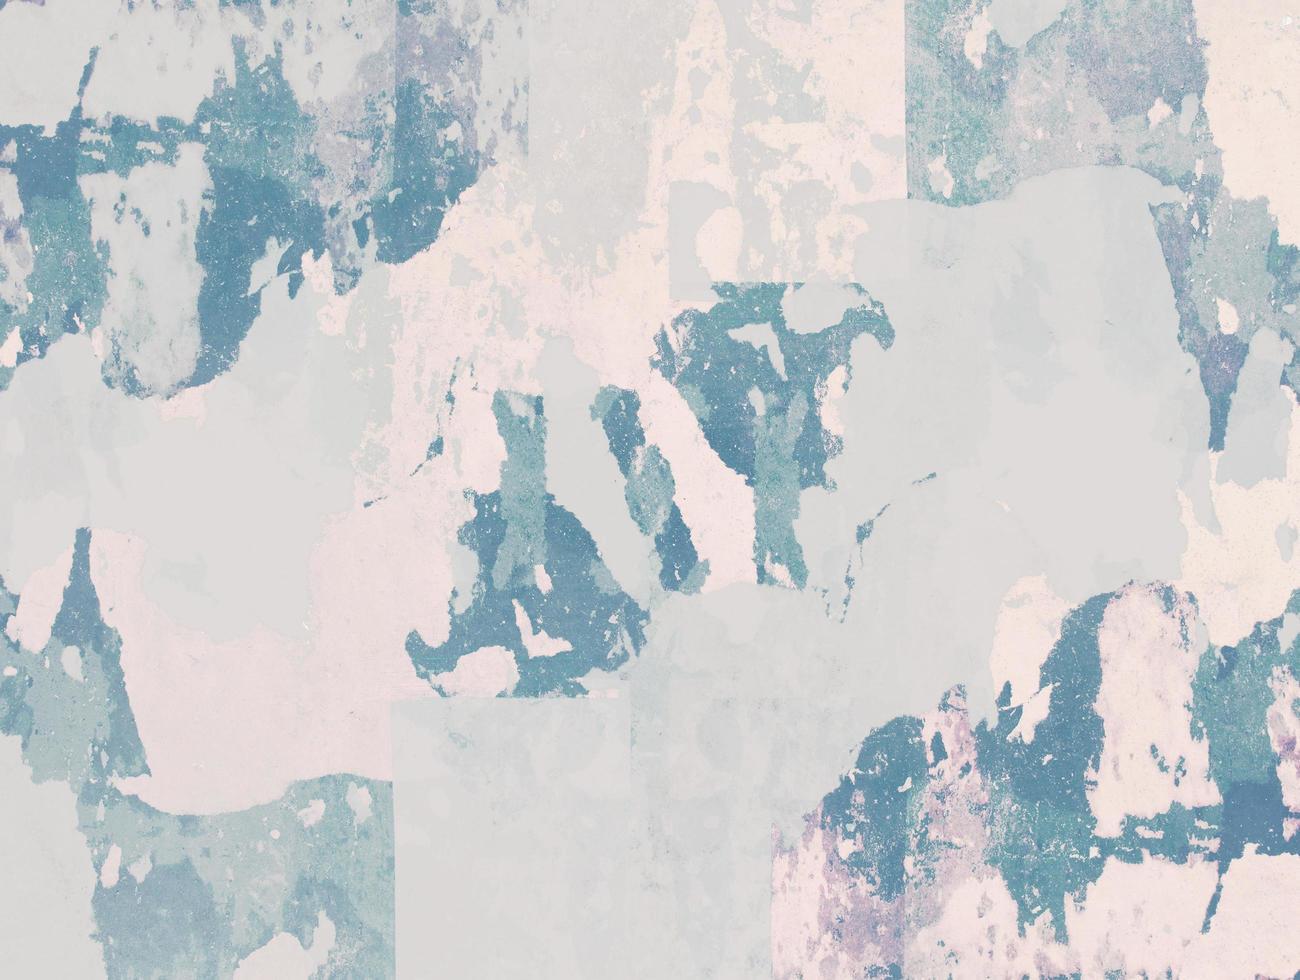 texture de mur abstrait grunge photo